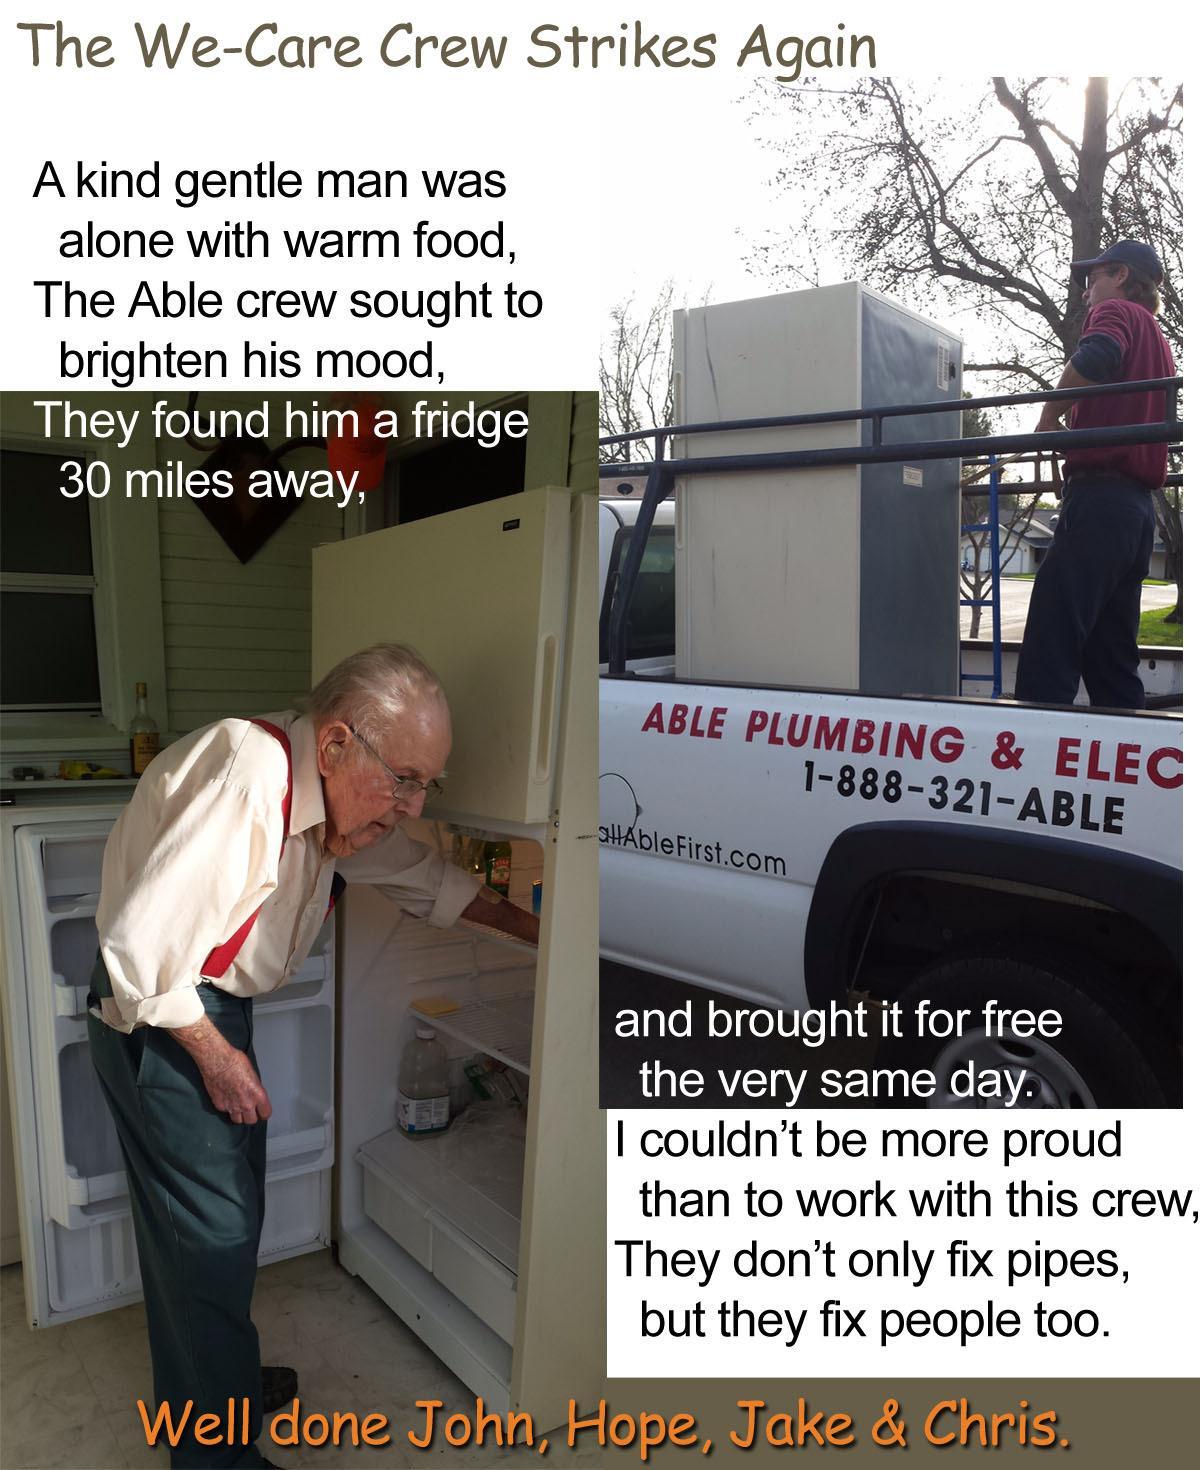 Able Plumbing & Electrical image 2